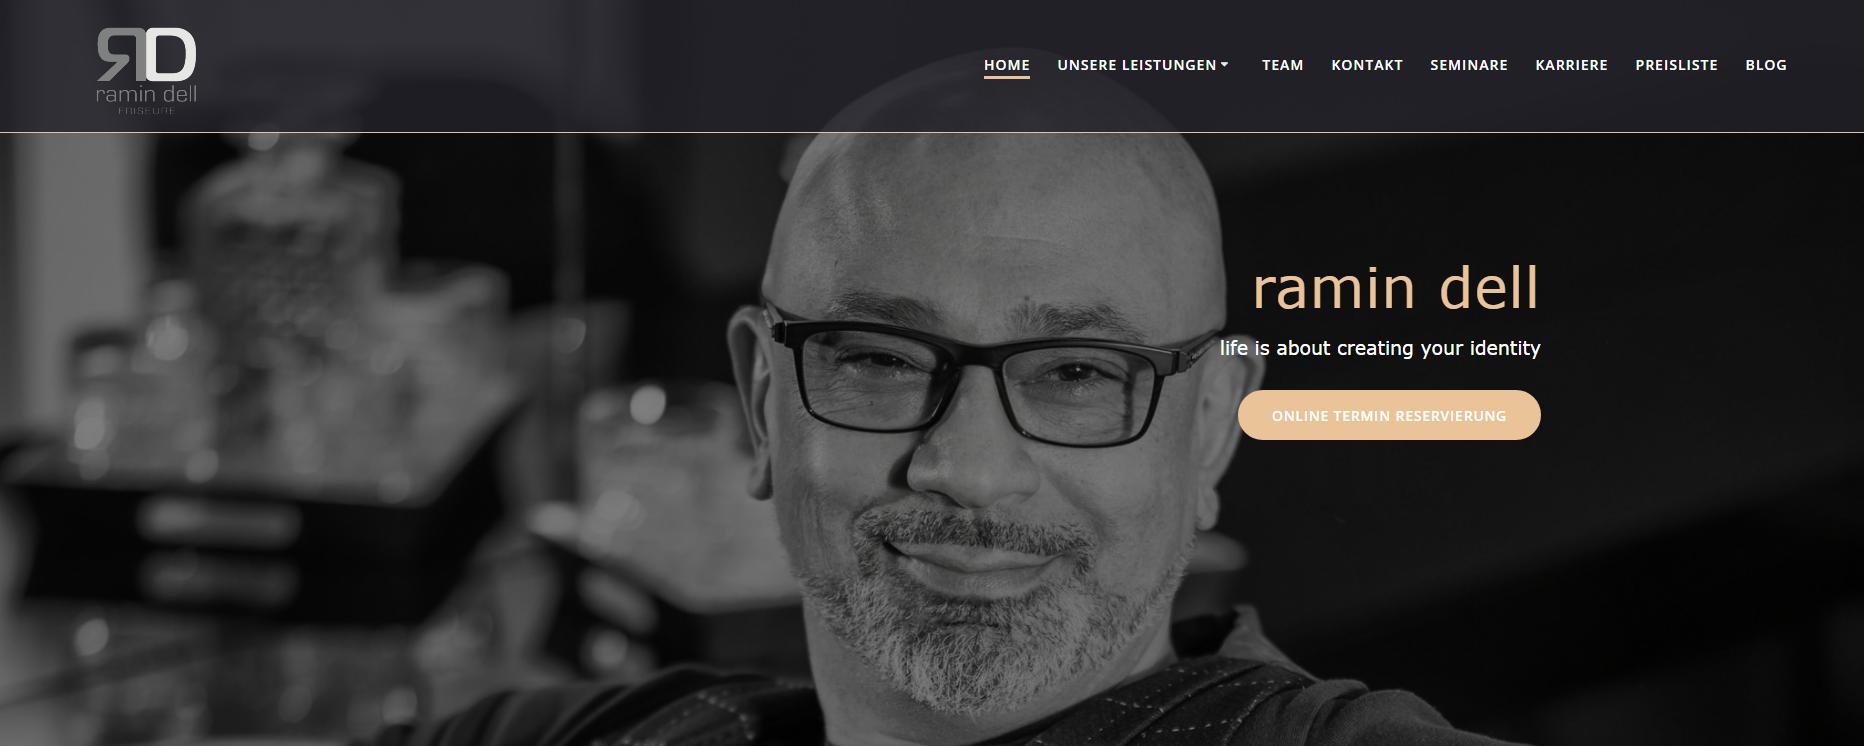 Friseur Coach - Christian Funk - Website Ramin